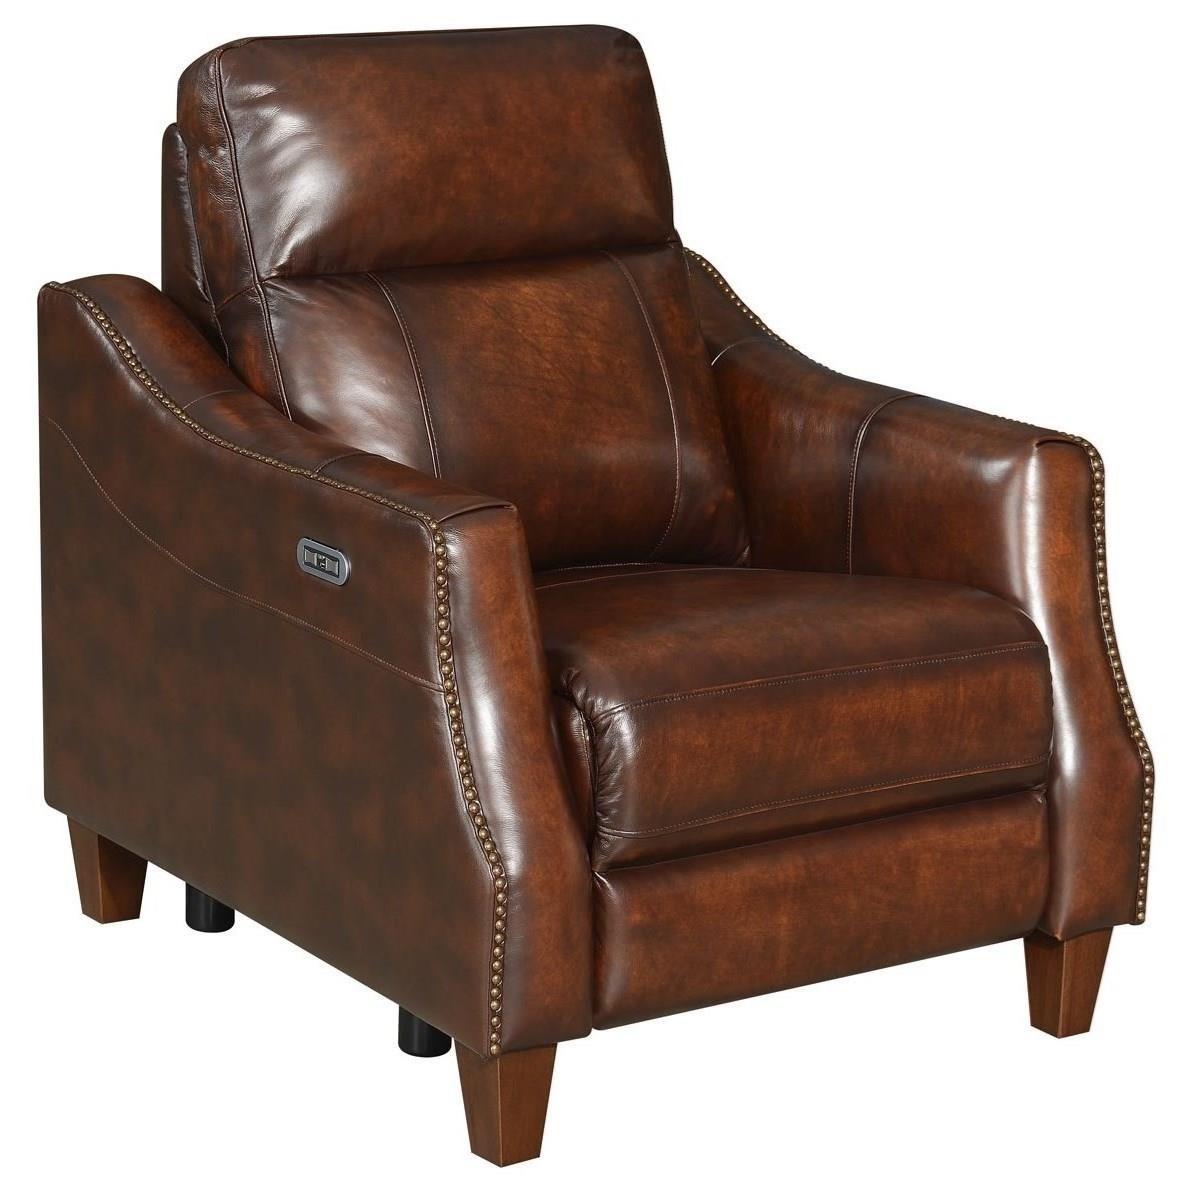 Dual-Power Recliner Chair